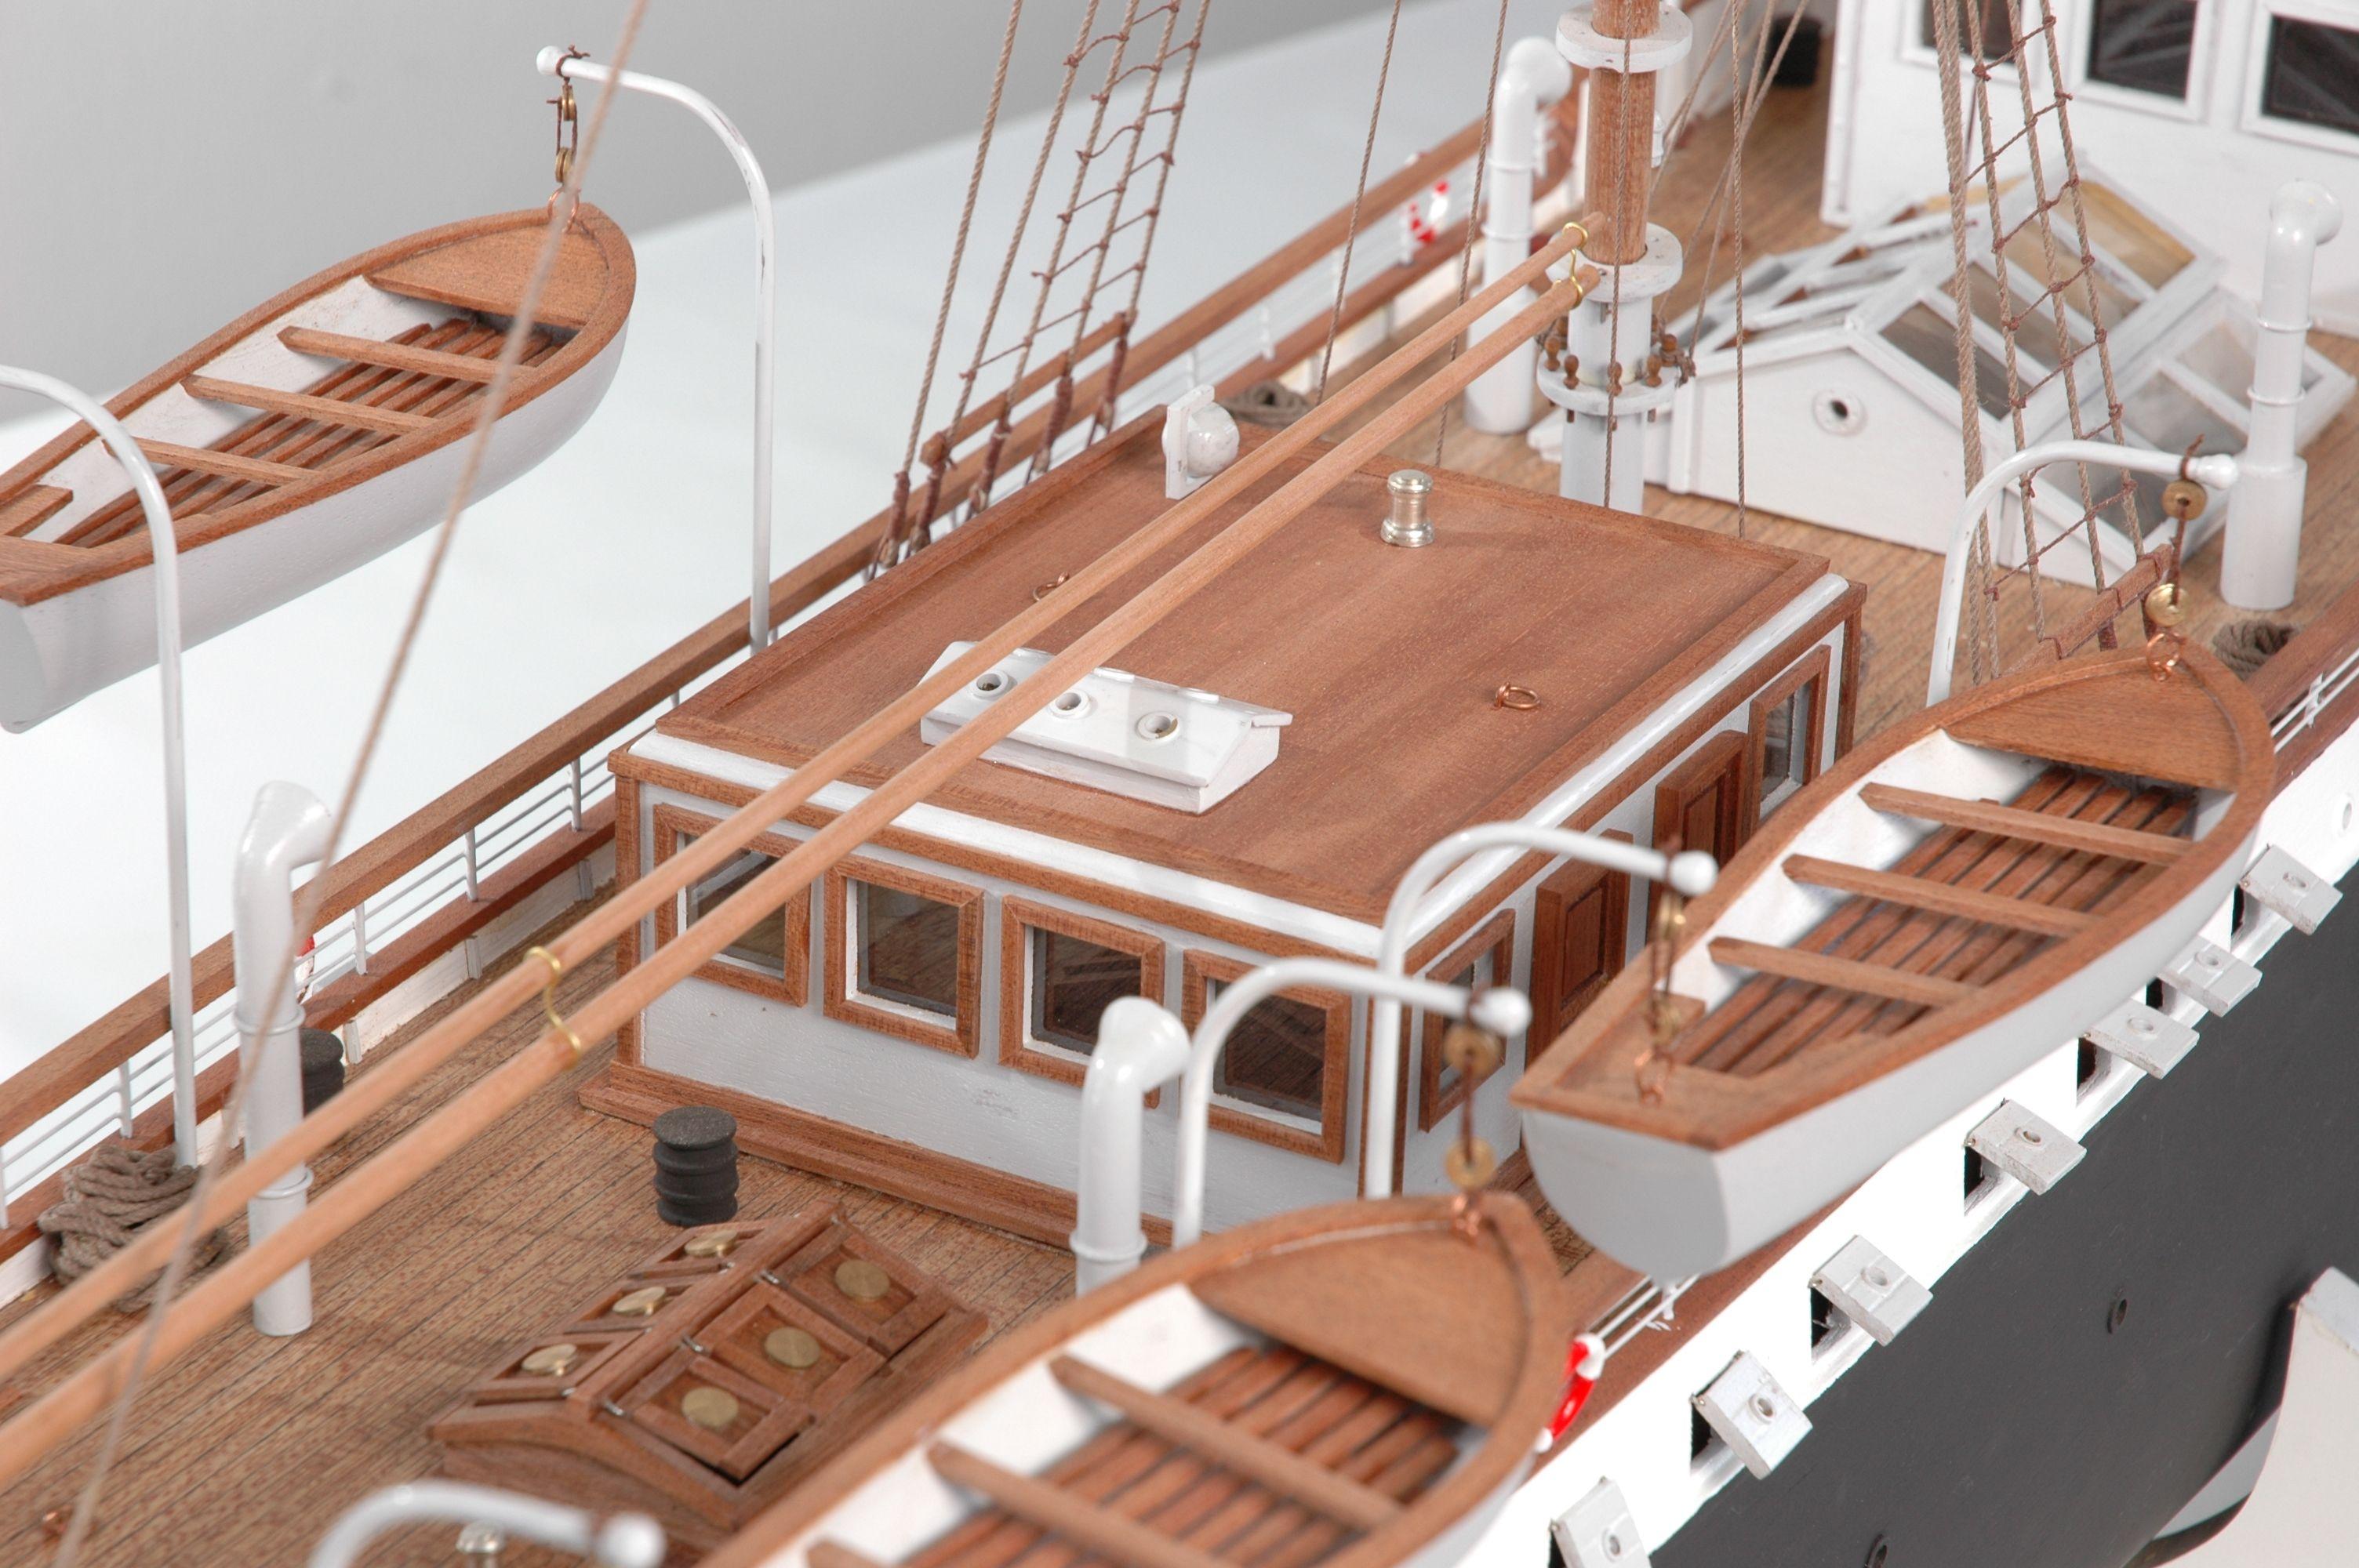 1416-6320-G-G-Loudon-Ship-Model-large-Premier-Range